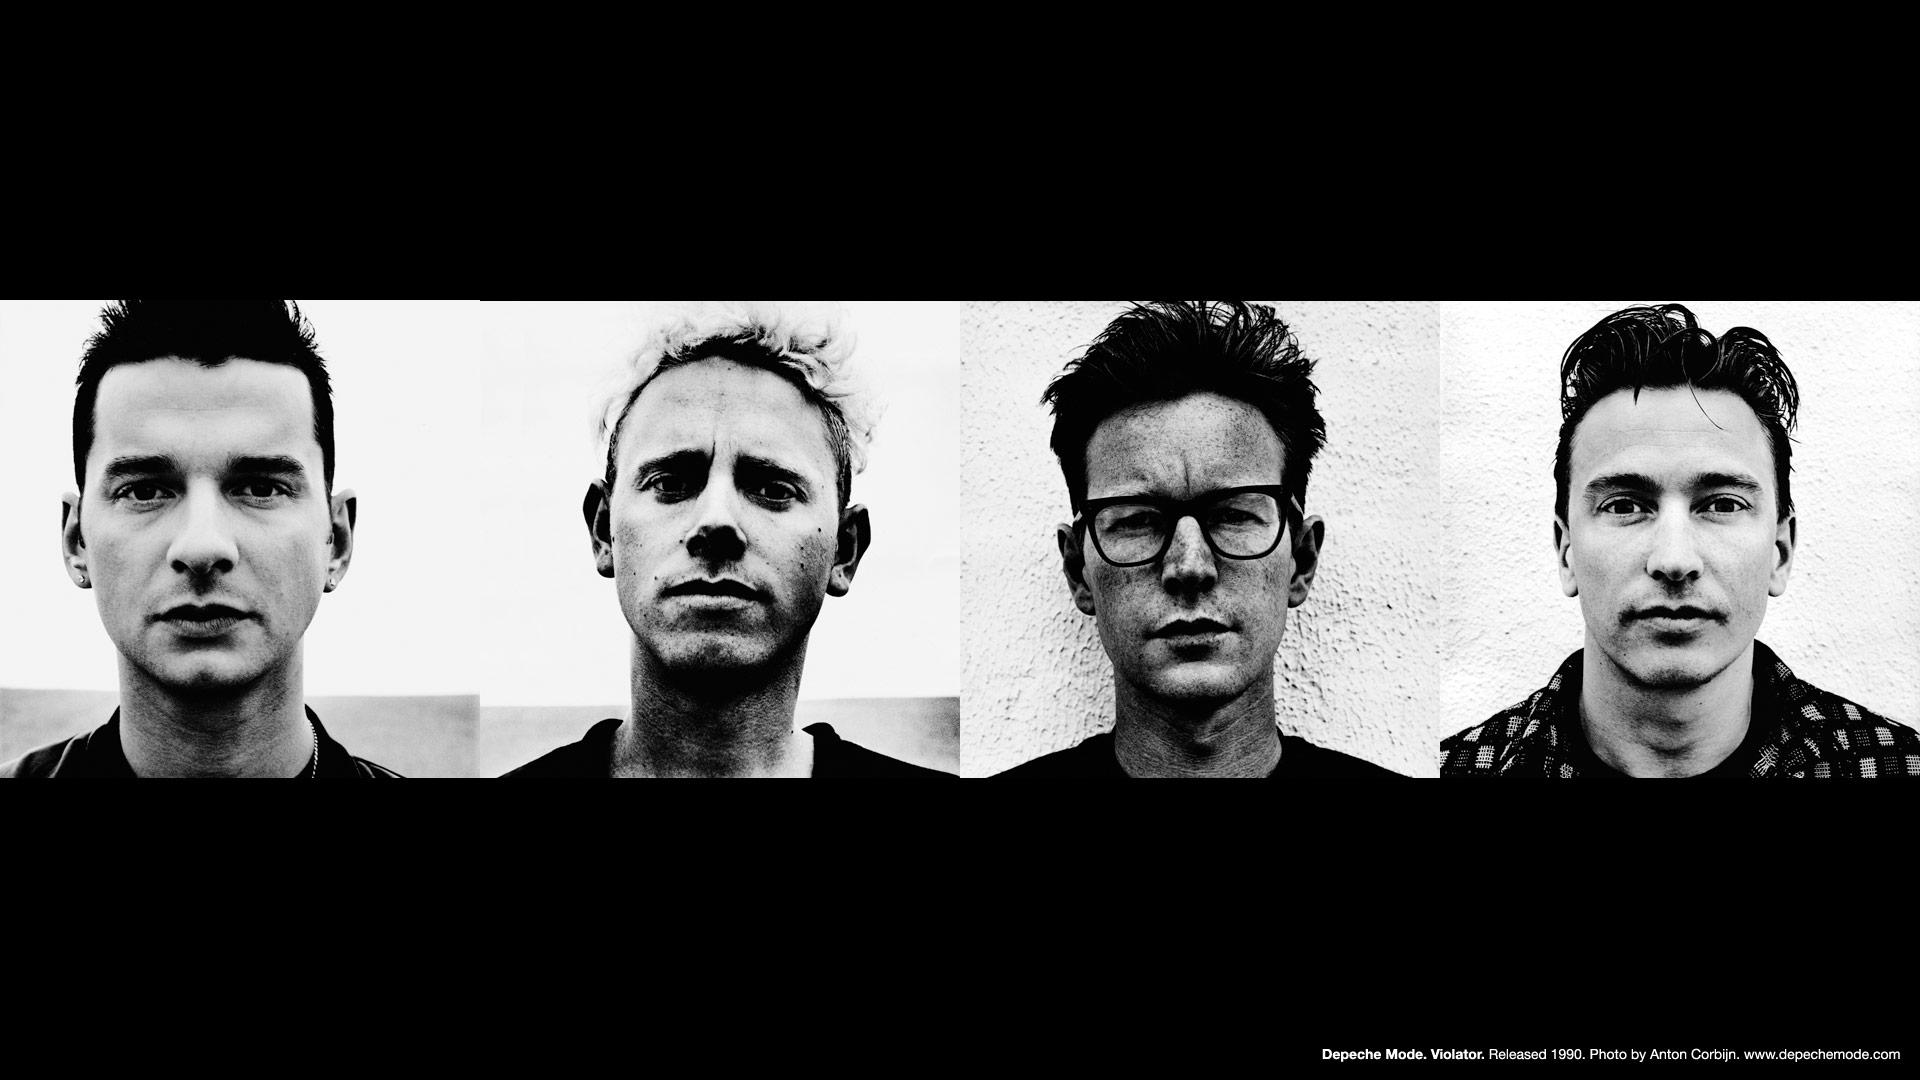 From Left: Dave Gahan, Martin Gore, Andy Fletcher, Alan Wilder  Image via DepecheMode.com